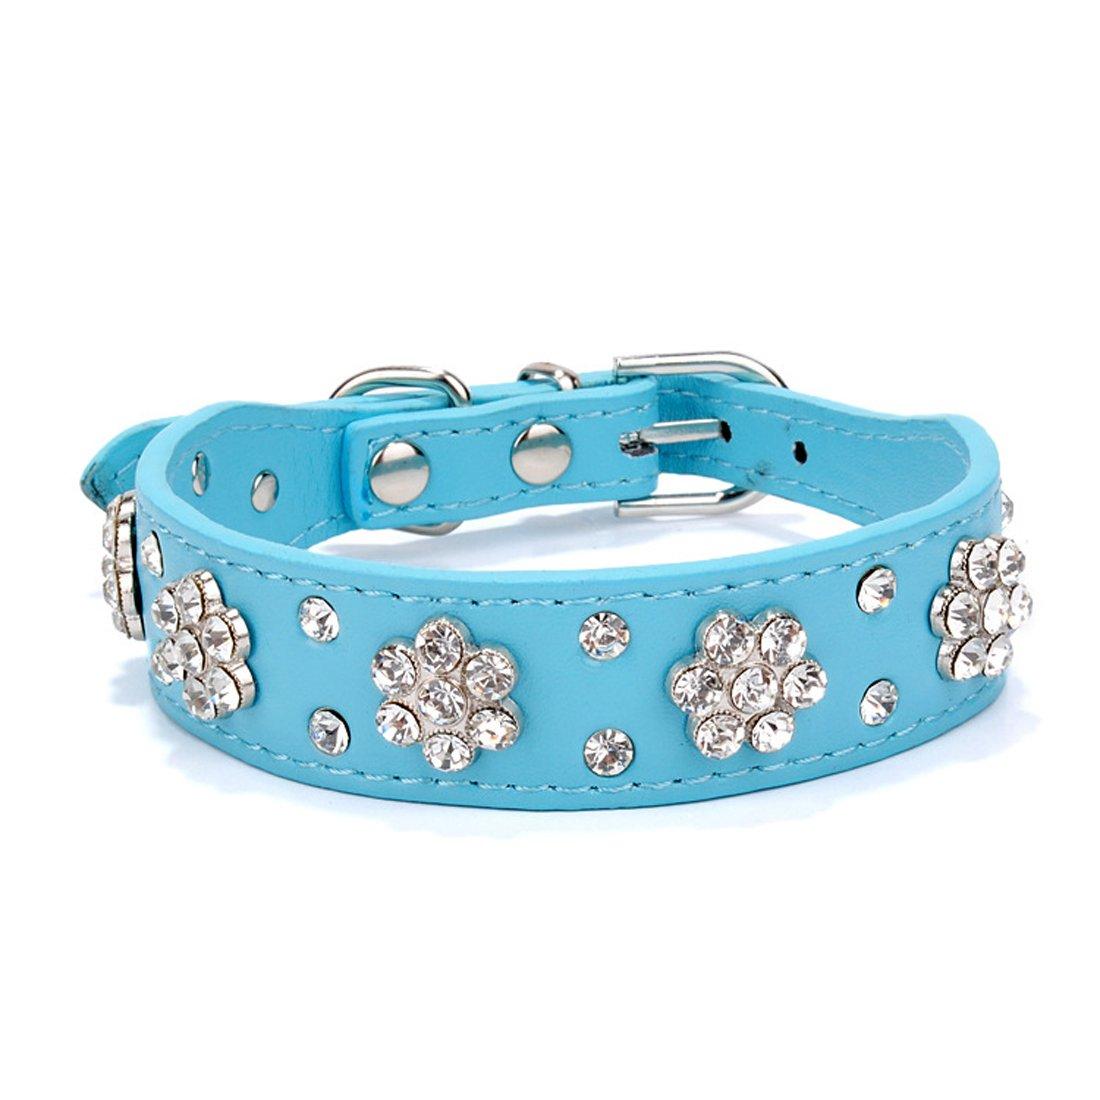 bluee M bluee M Flyusa 2 Rows Rhinestone Bling Plum Blossom Studded Leather Dog Leash Dog Collar for Small or Medium Boy Girls Dog Pet,bluee,M